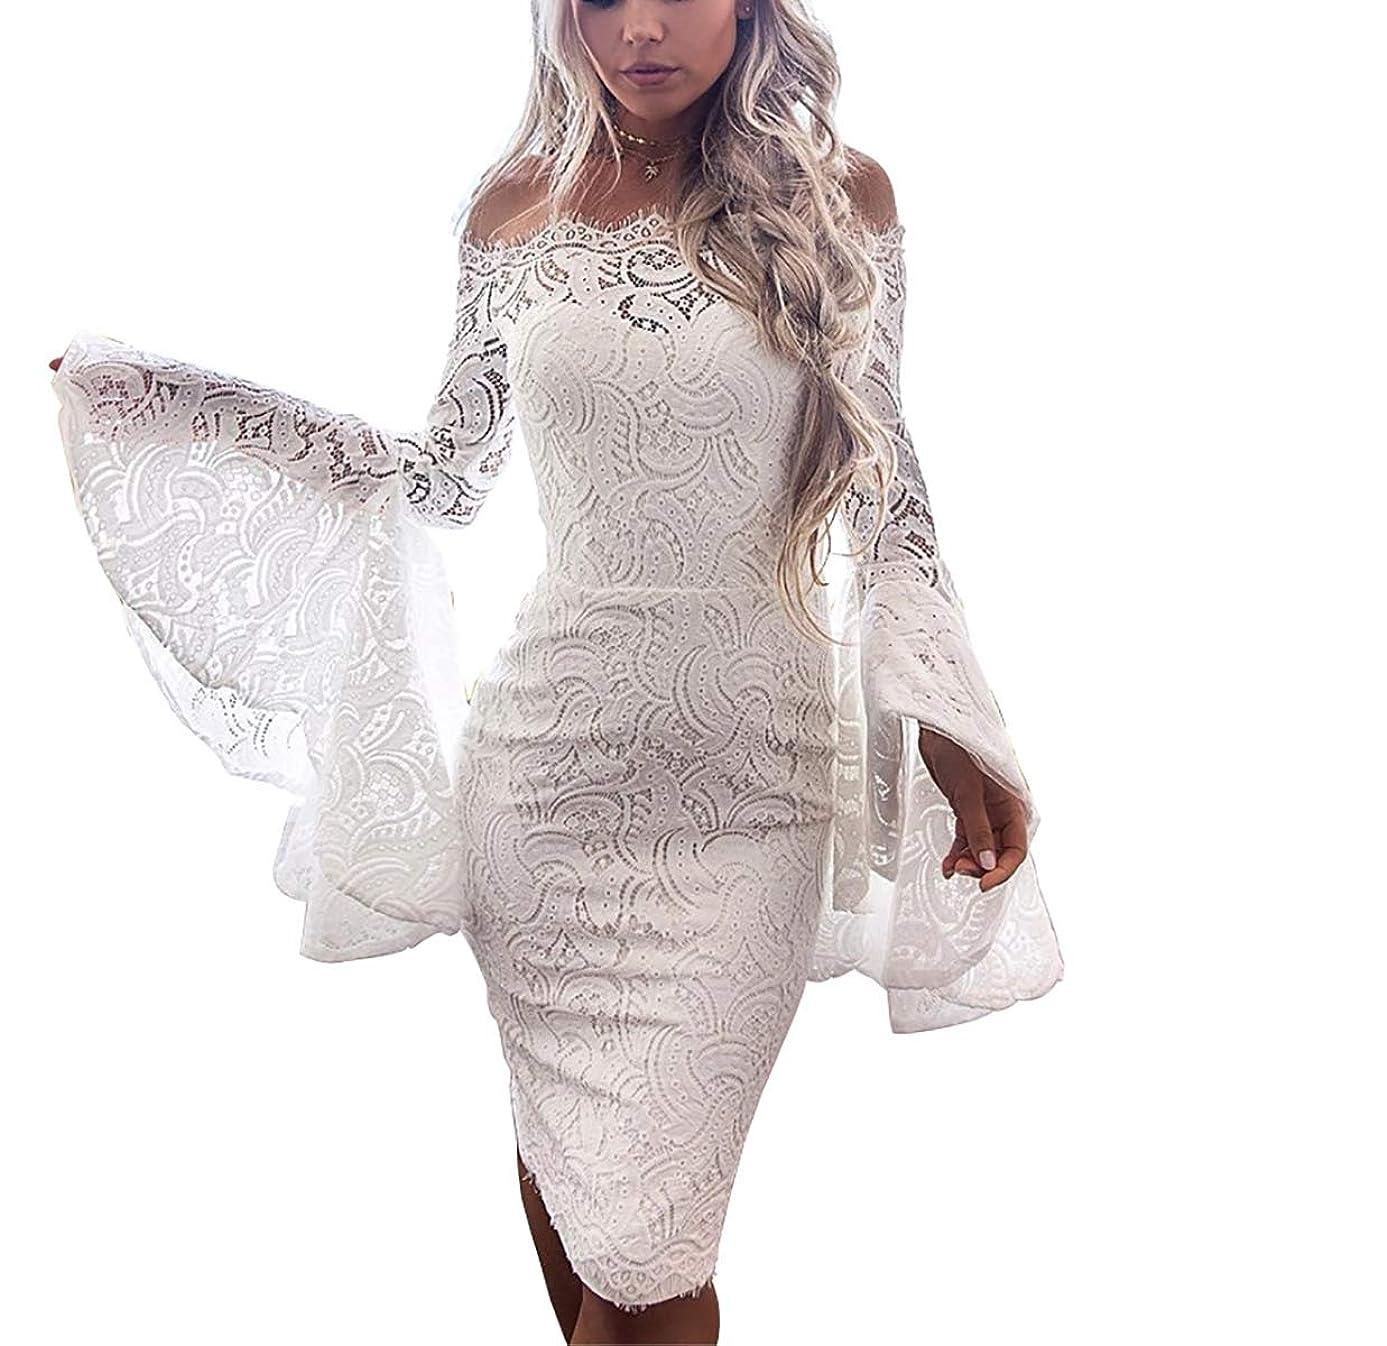 Mycherish Women's Sexy Lace Dress with Long Flowy Sleeve Off Shoulder Crop Tops Bodycon Fancy Dress Skirts